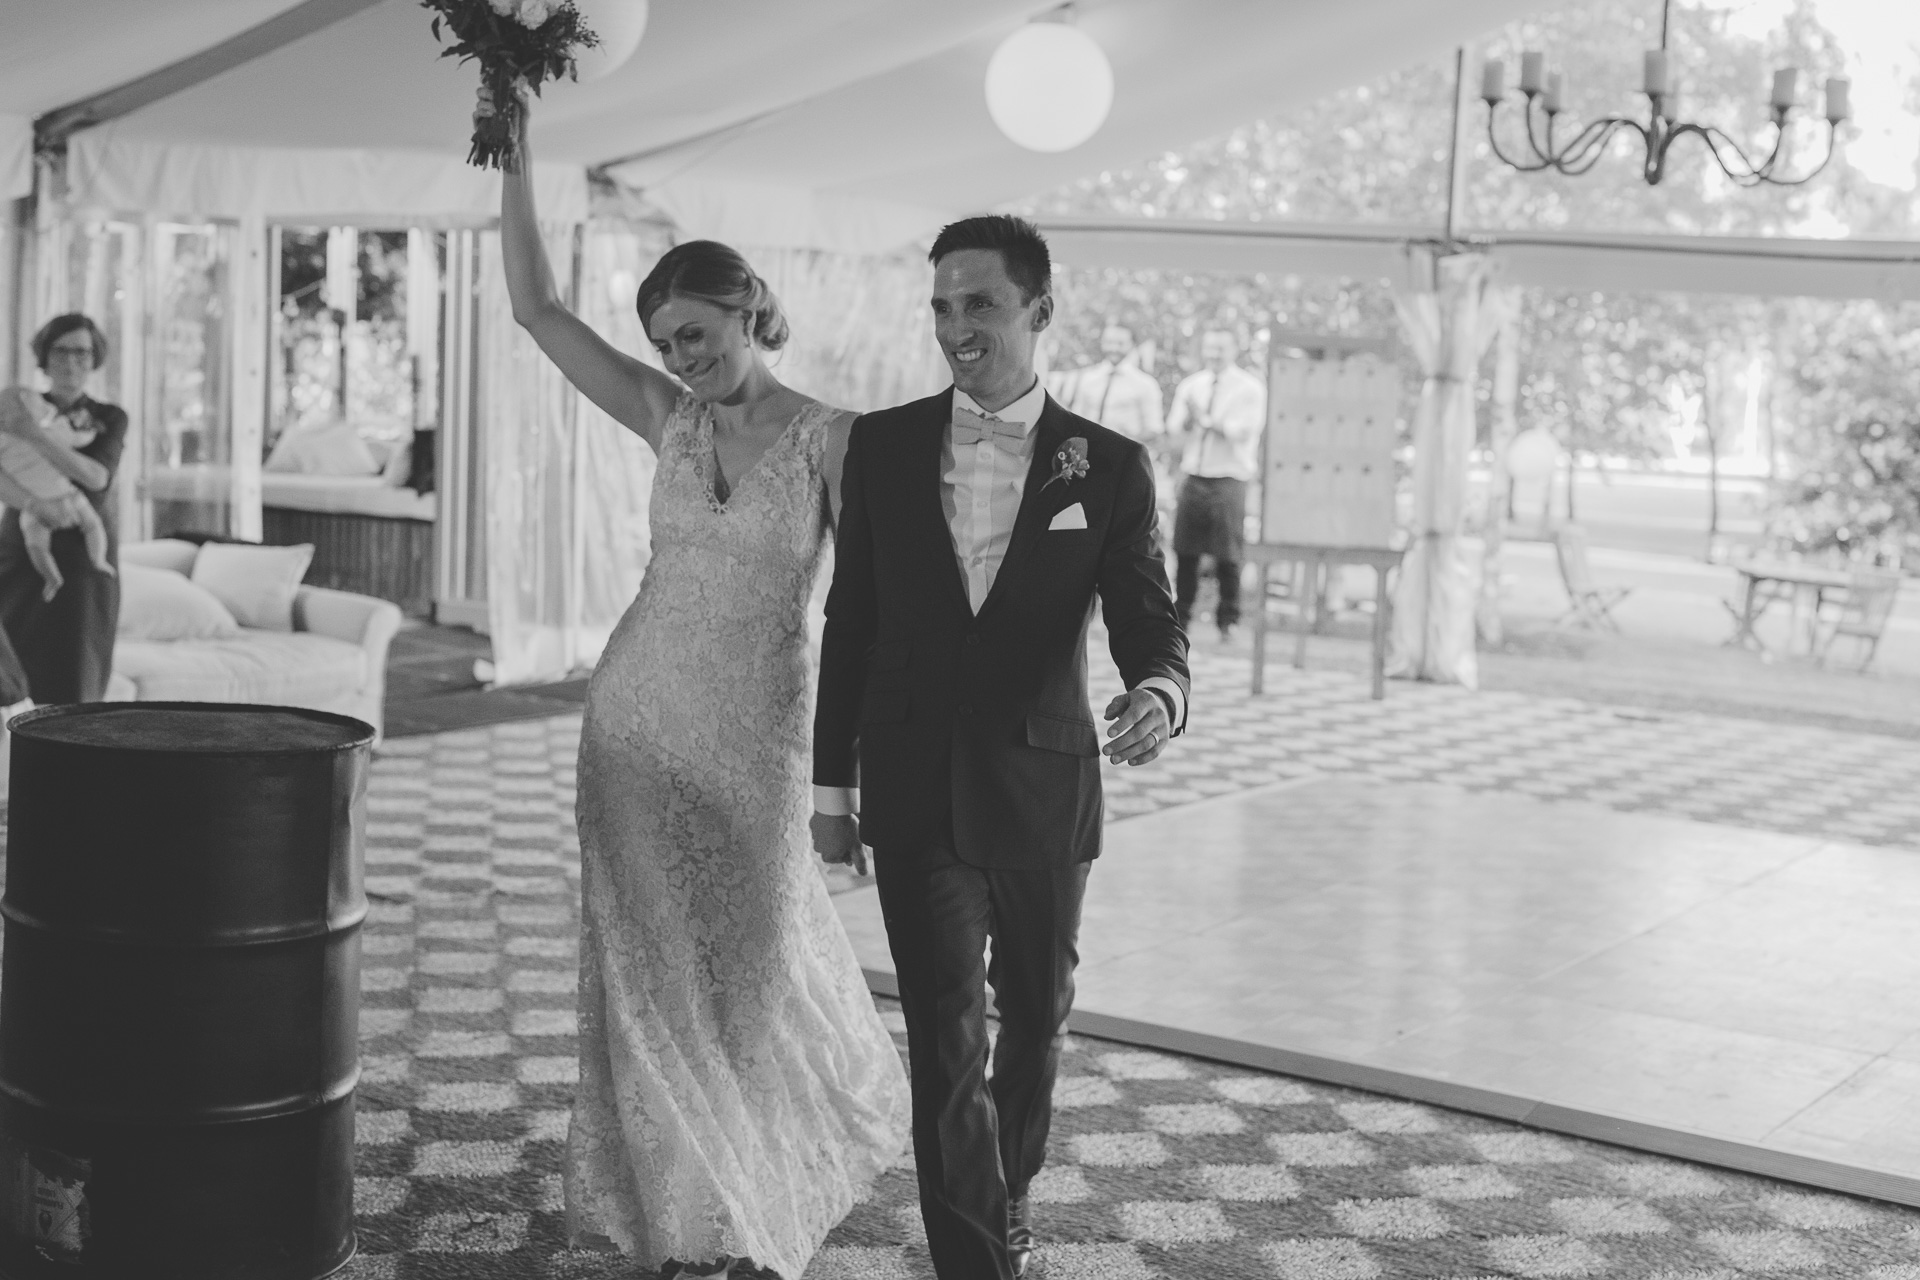 20161112 - Heath_Ruth_Wombat_Hollow_Wedding | 453-2.jpg